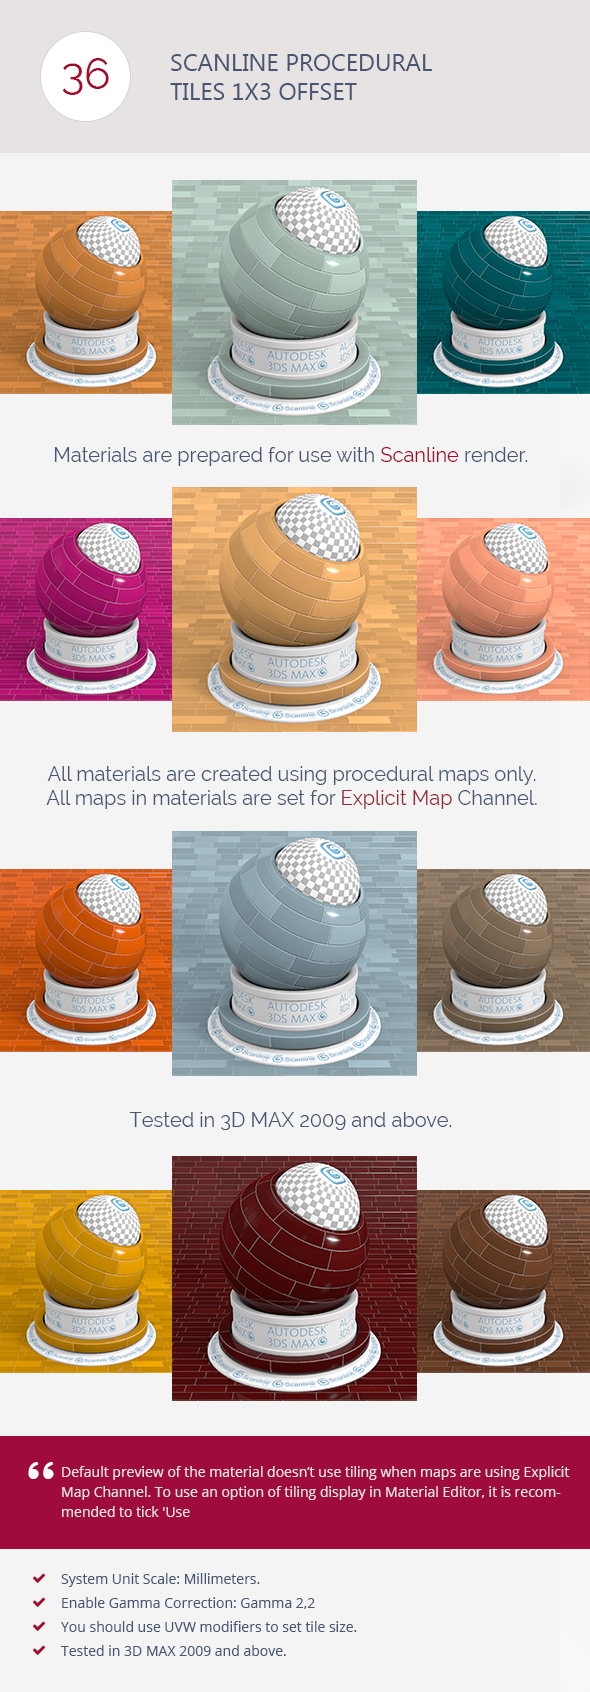 3DOcean Scanline Procedural Tiles 1x3 Offset 6766881